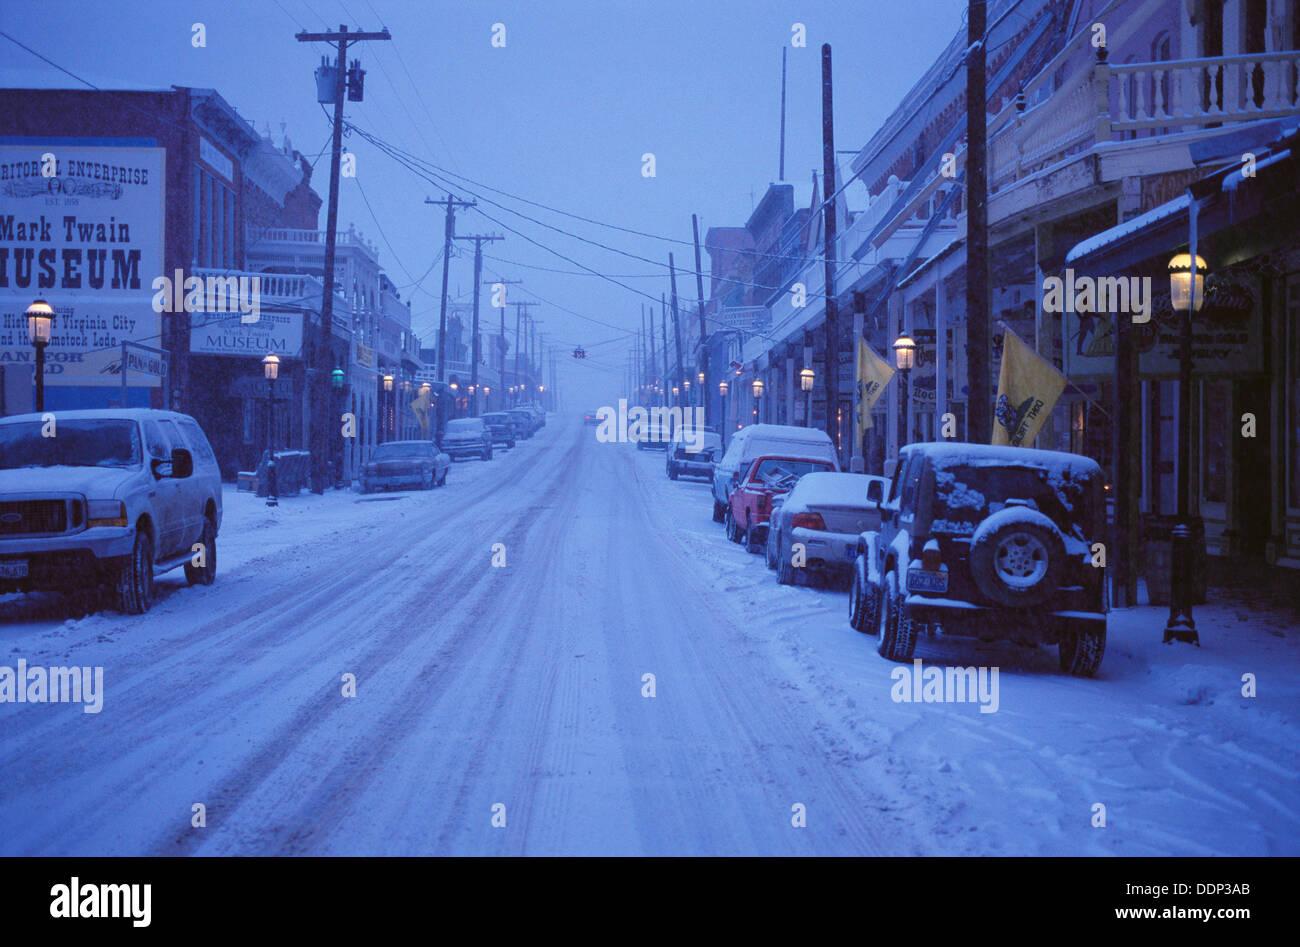 Nevada City Nevada Usa Snow High Resolution Stock Photography And Images Alamy